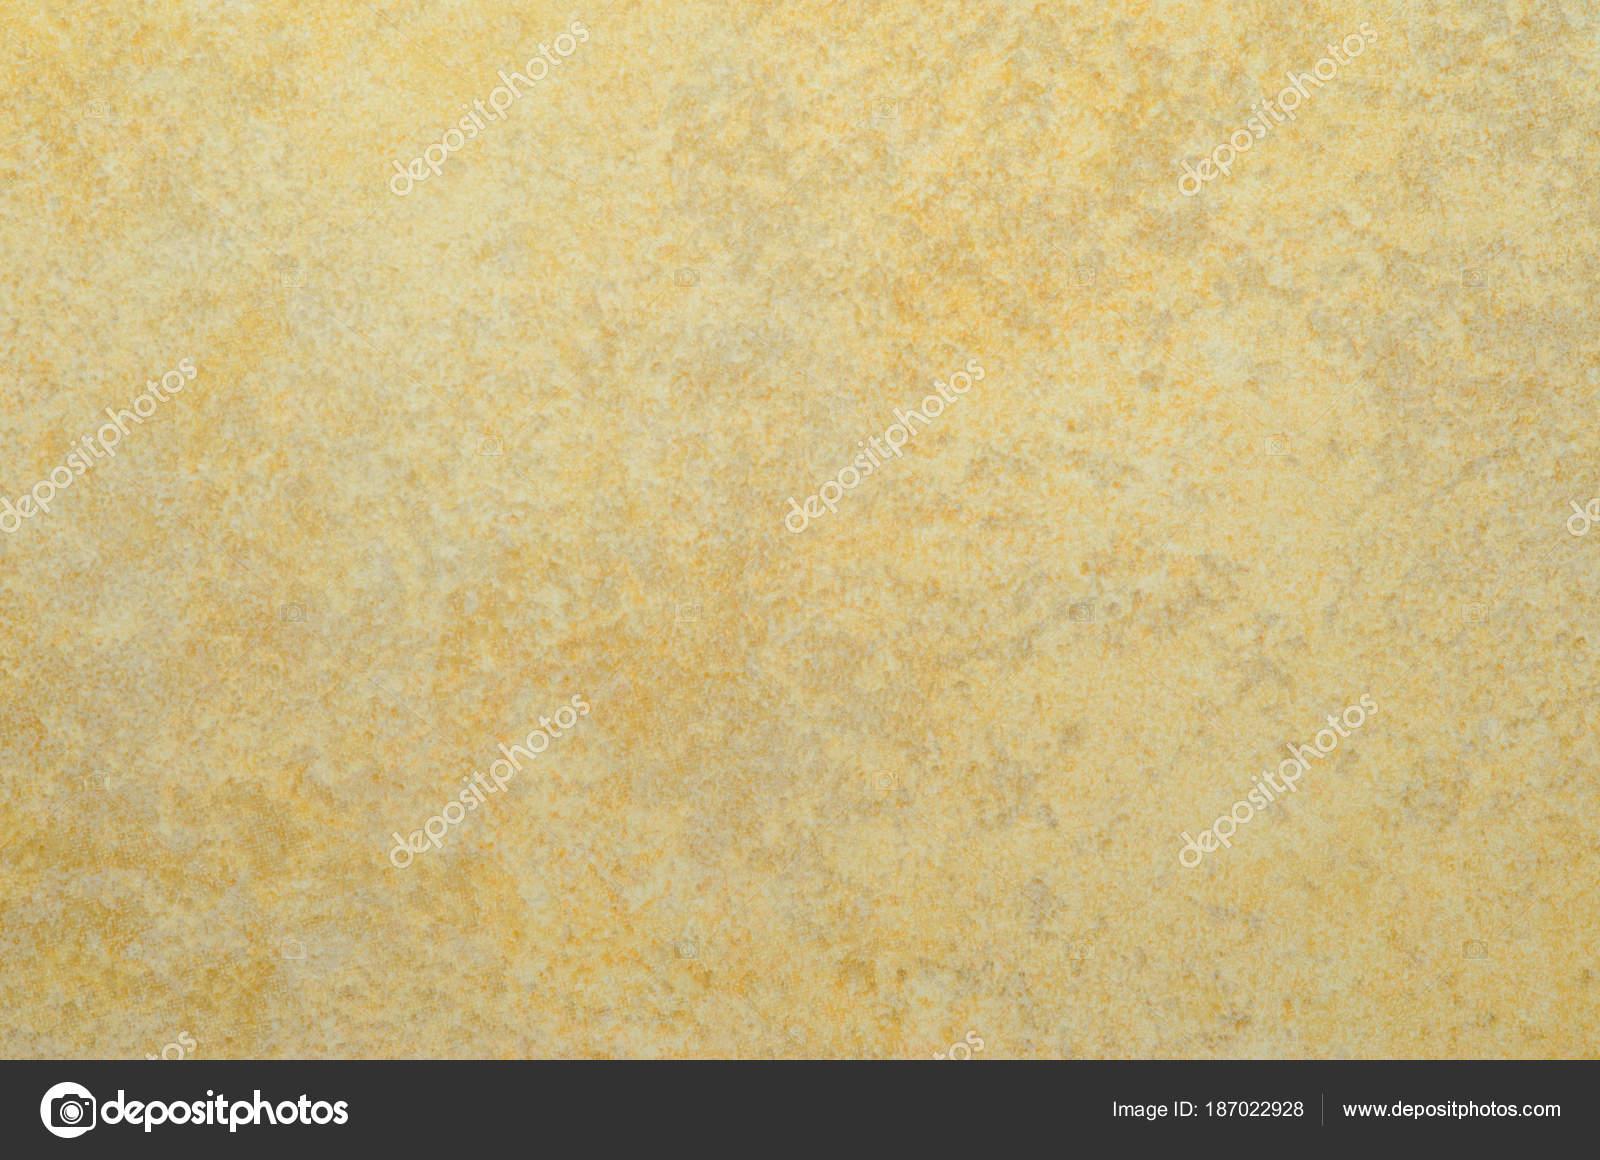 Gres porcellanato piastrelle texture pattern naturale colore